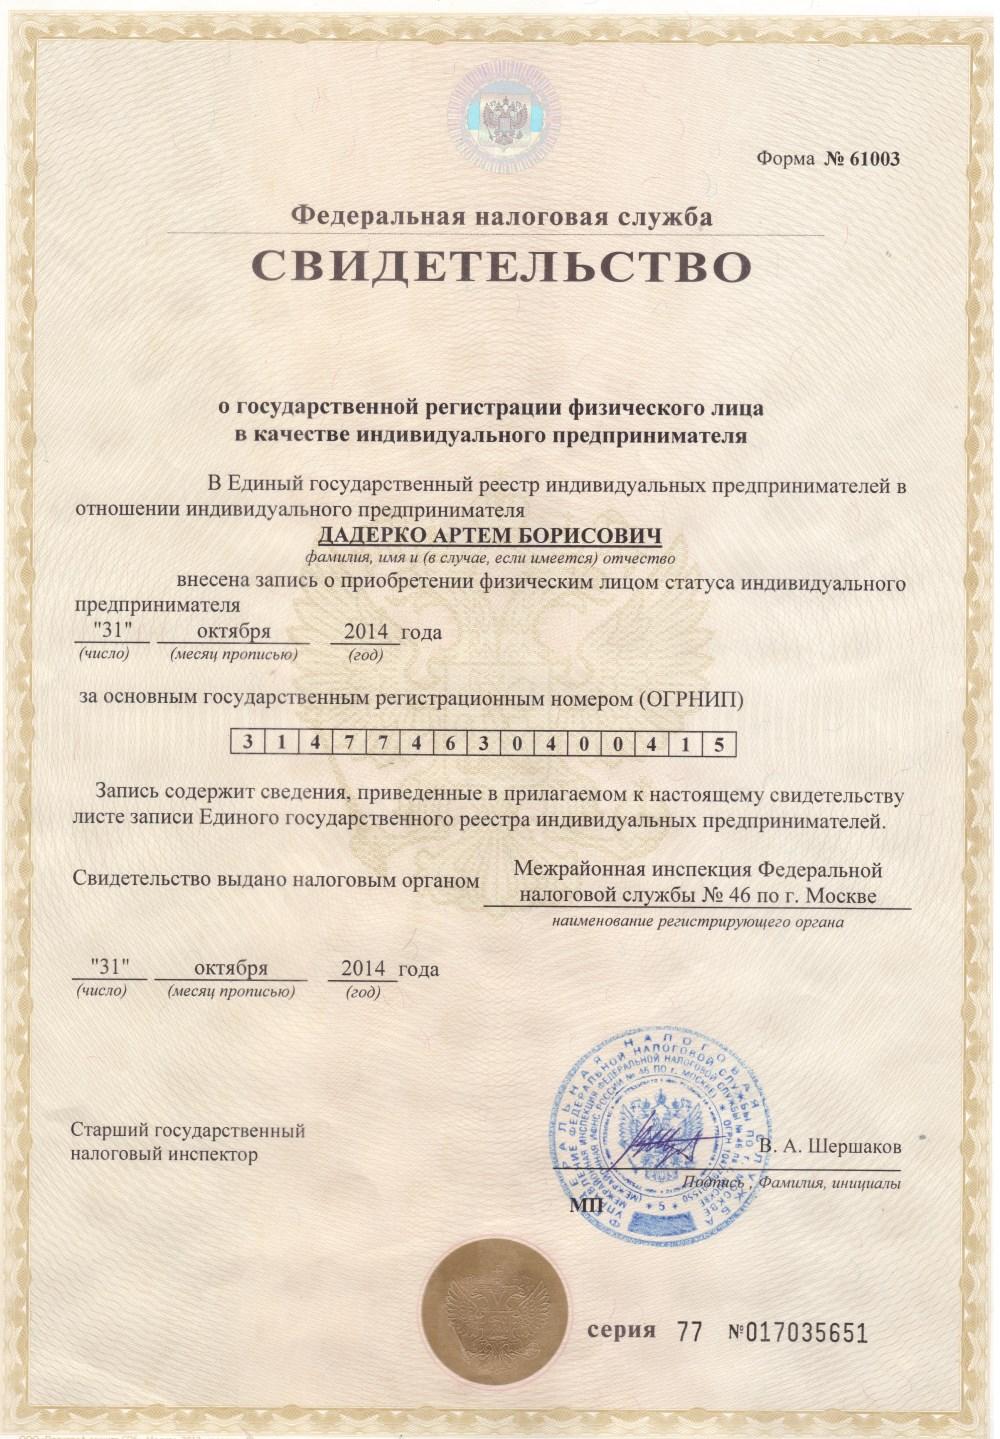 ЦентроТехника - Сертификат ИП